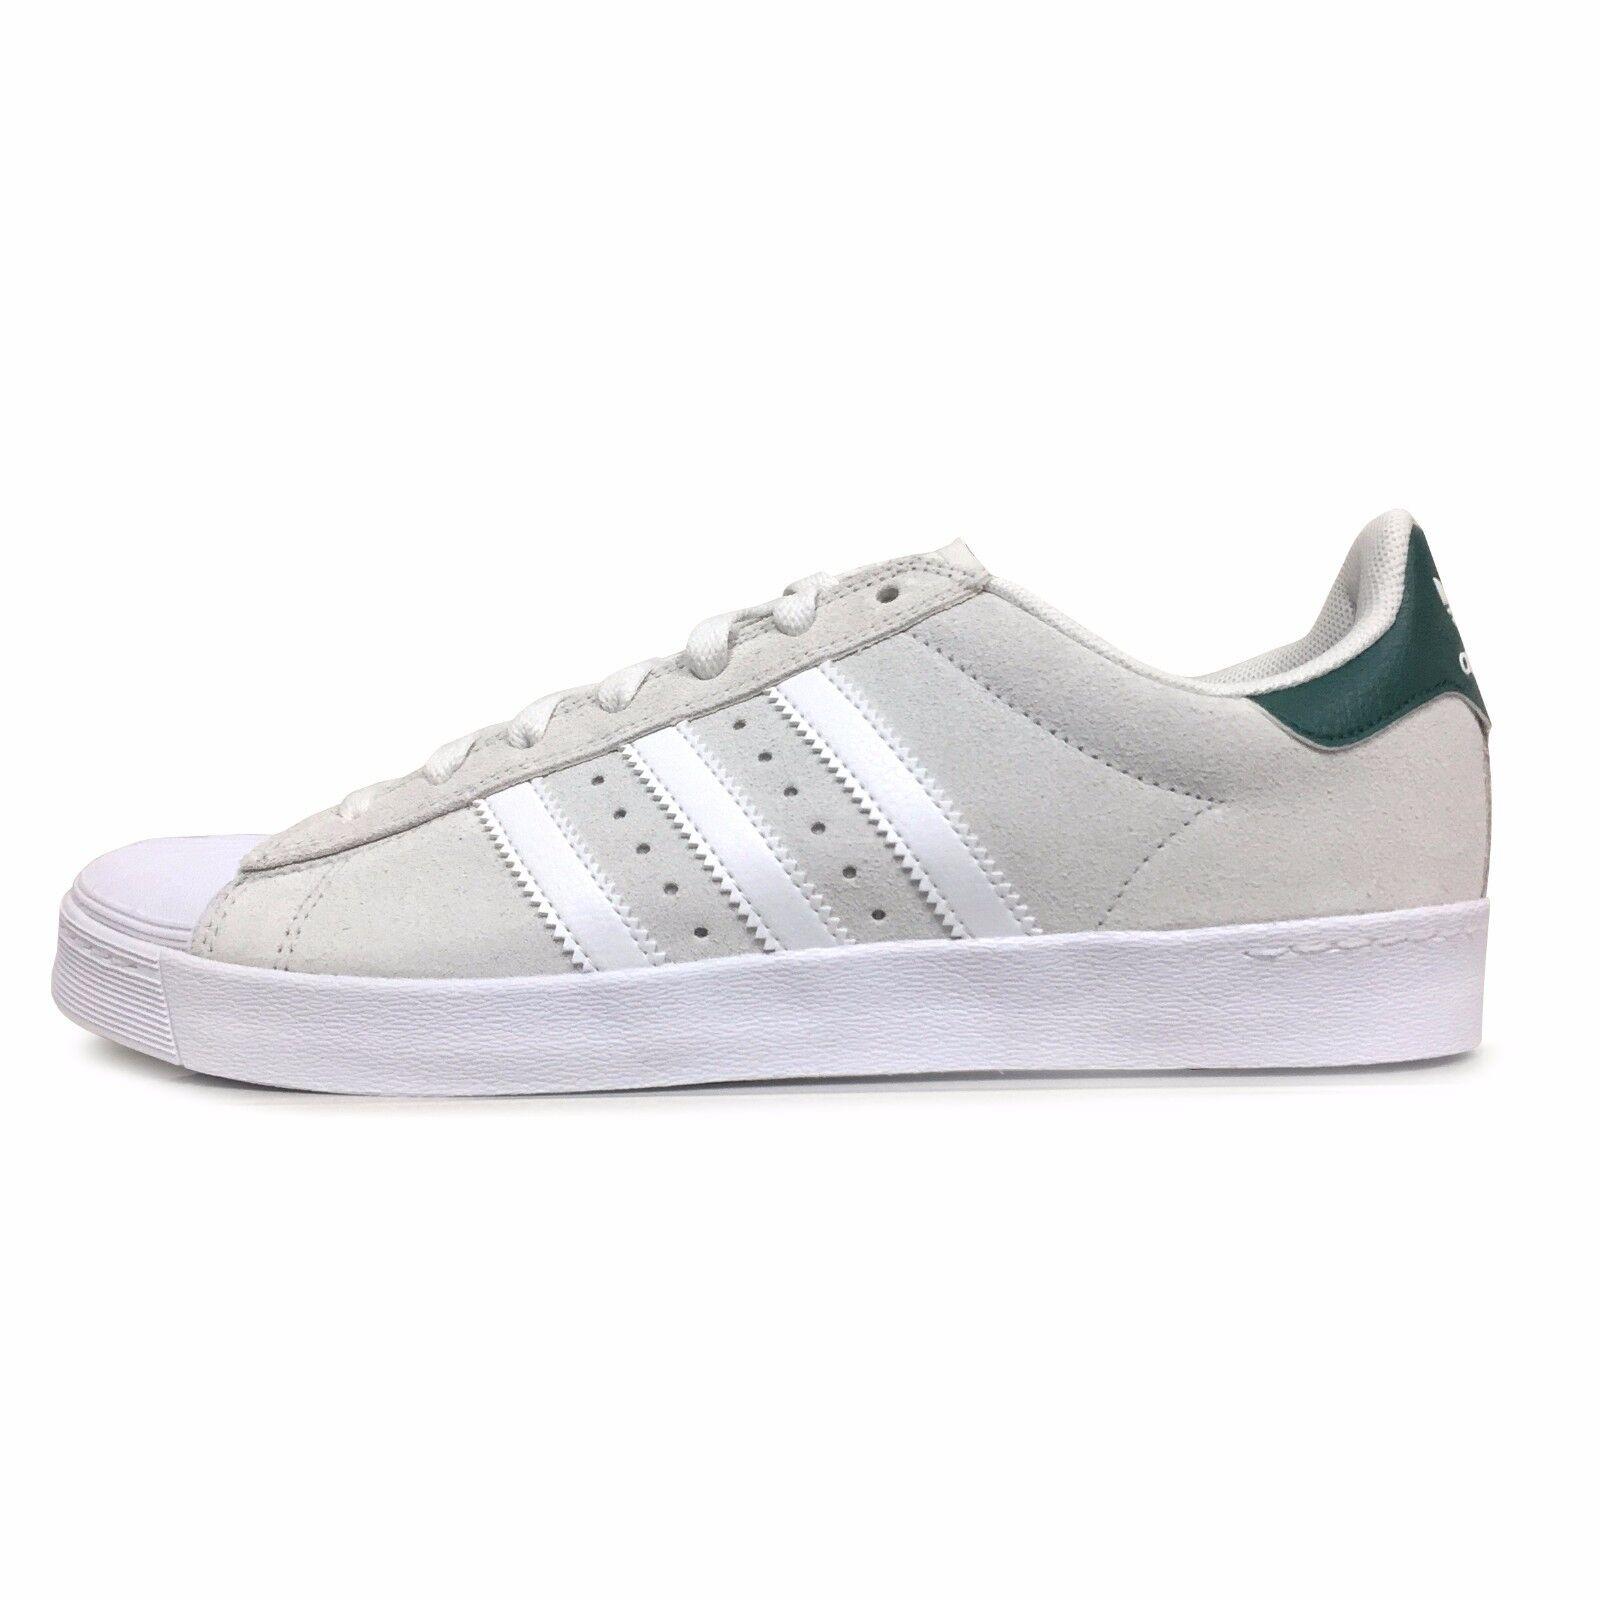 Adidas Superstar Hombre Vulc ADV | b27393 Hombre Superstar skate Zapatos | blanco / verde barato y hermoso moda 65fa41